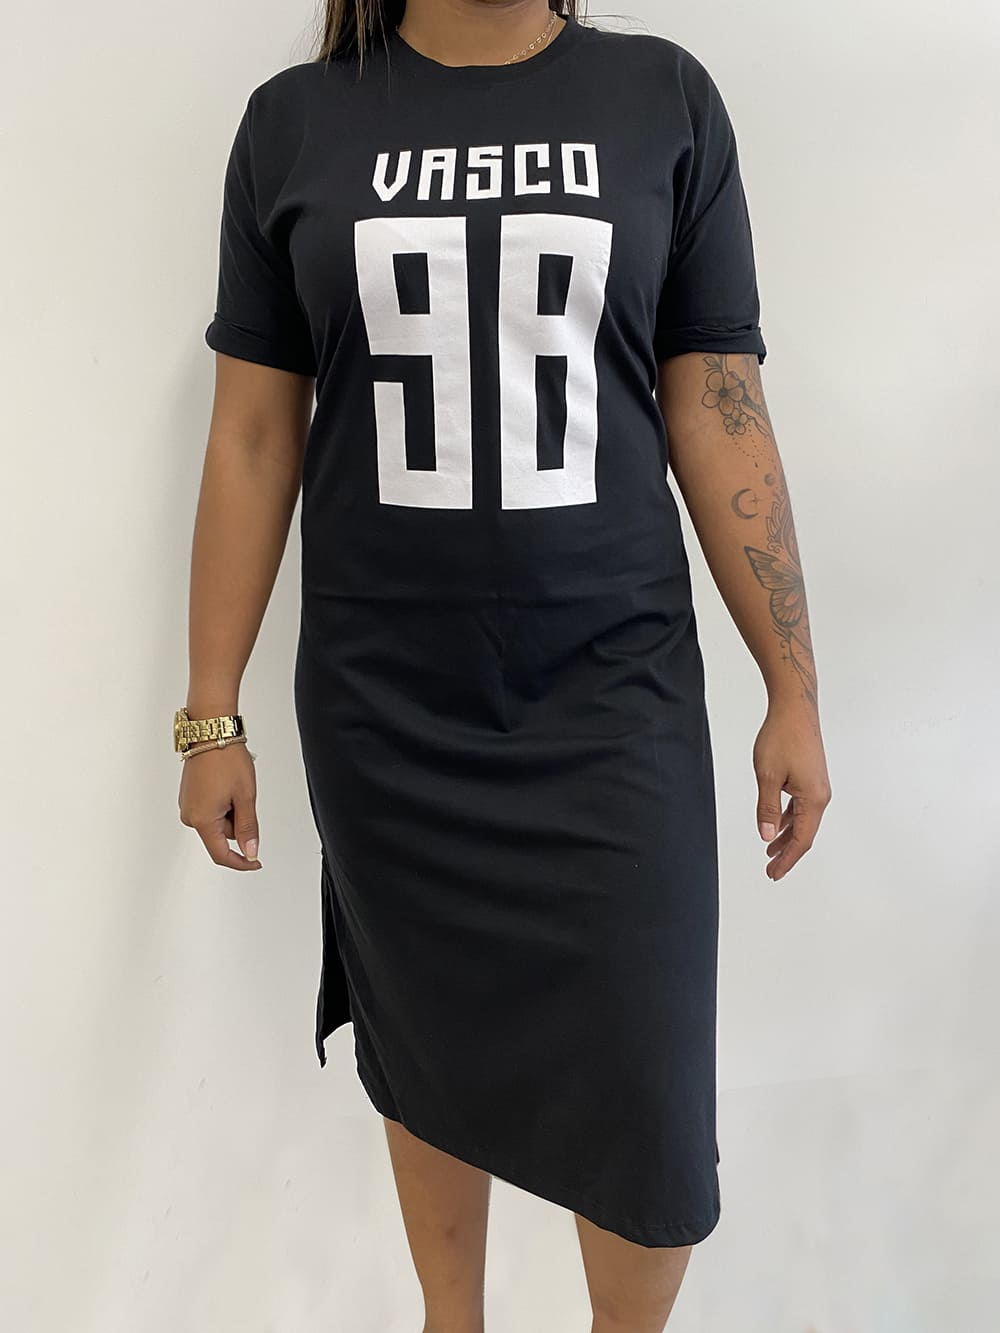 Vasco Vestido Blusão Oversized 98